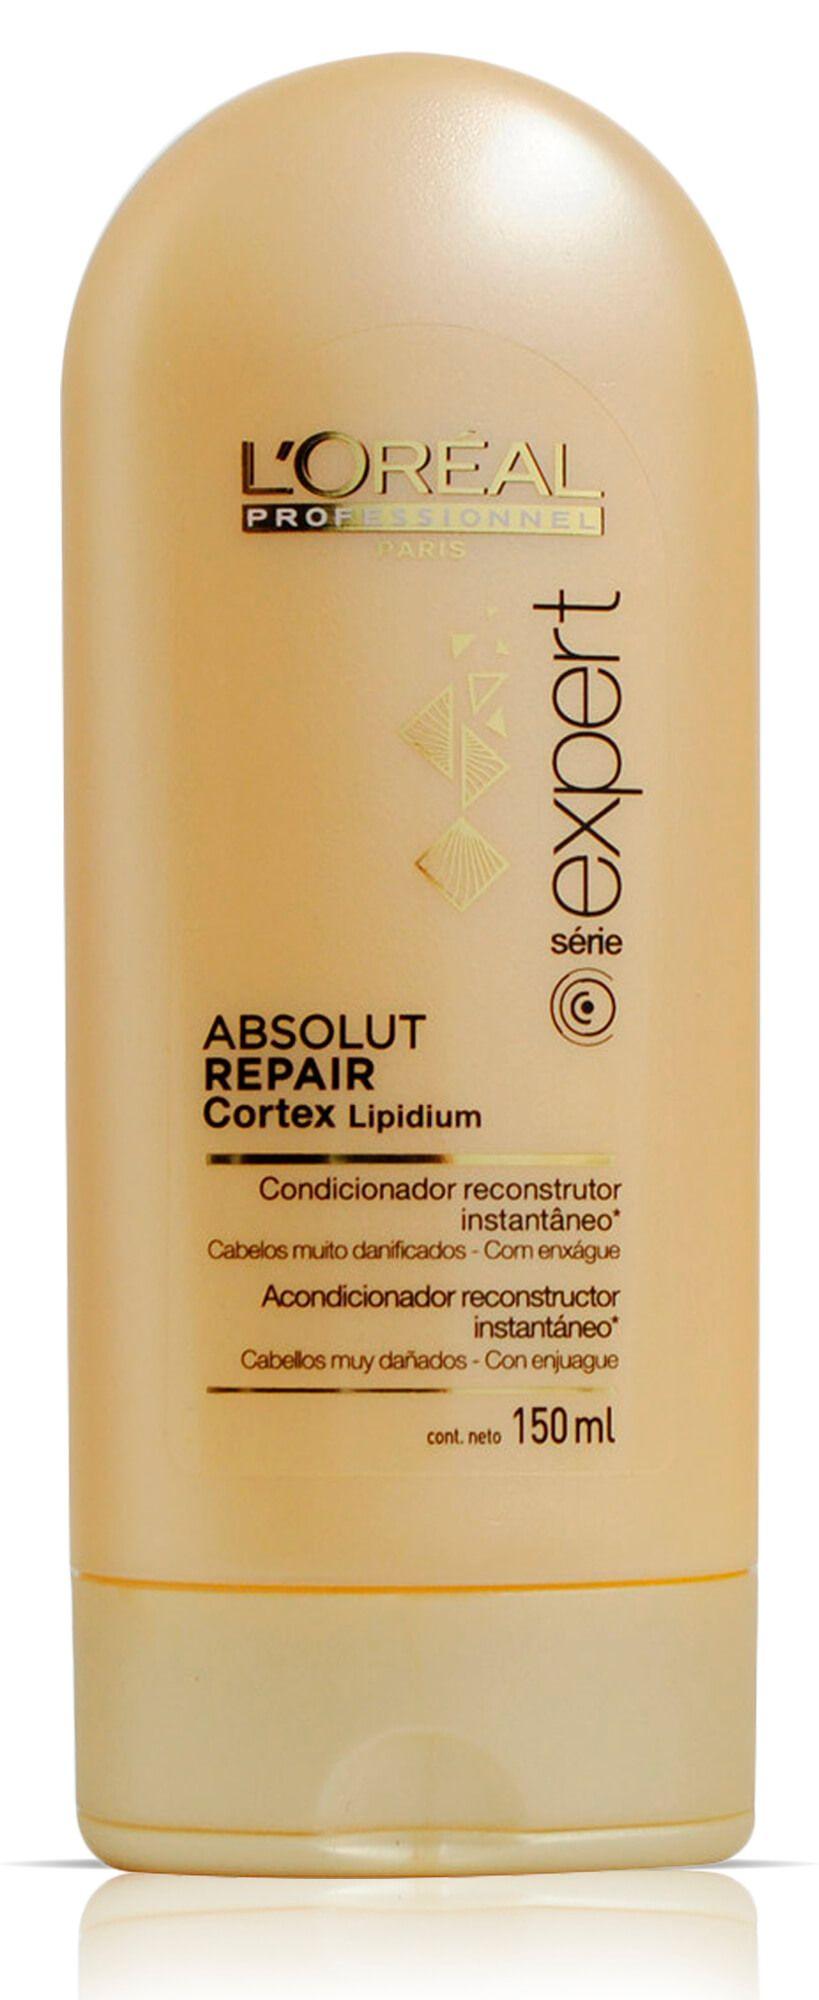 Condicionador L'oréal Absolut Repair Cortex Lipidium - 150ml